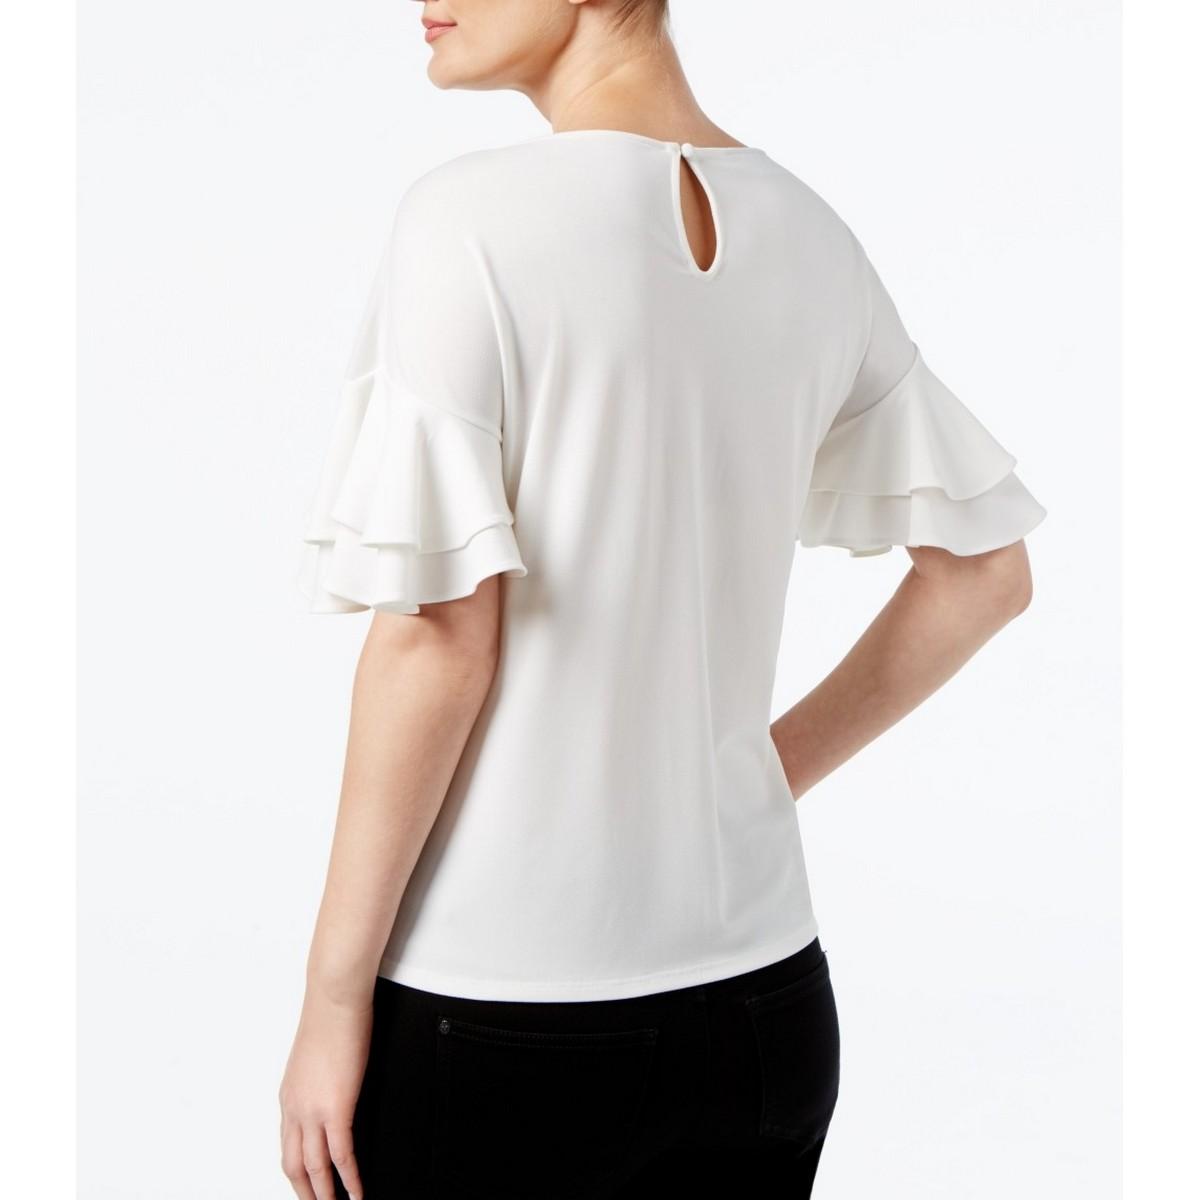 INC-NEW-Women-039-s-Ruffled-sleeve-Blouse-Shirt-Top-TEDO thumbnail 3